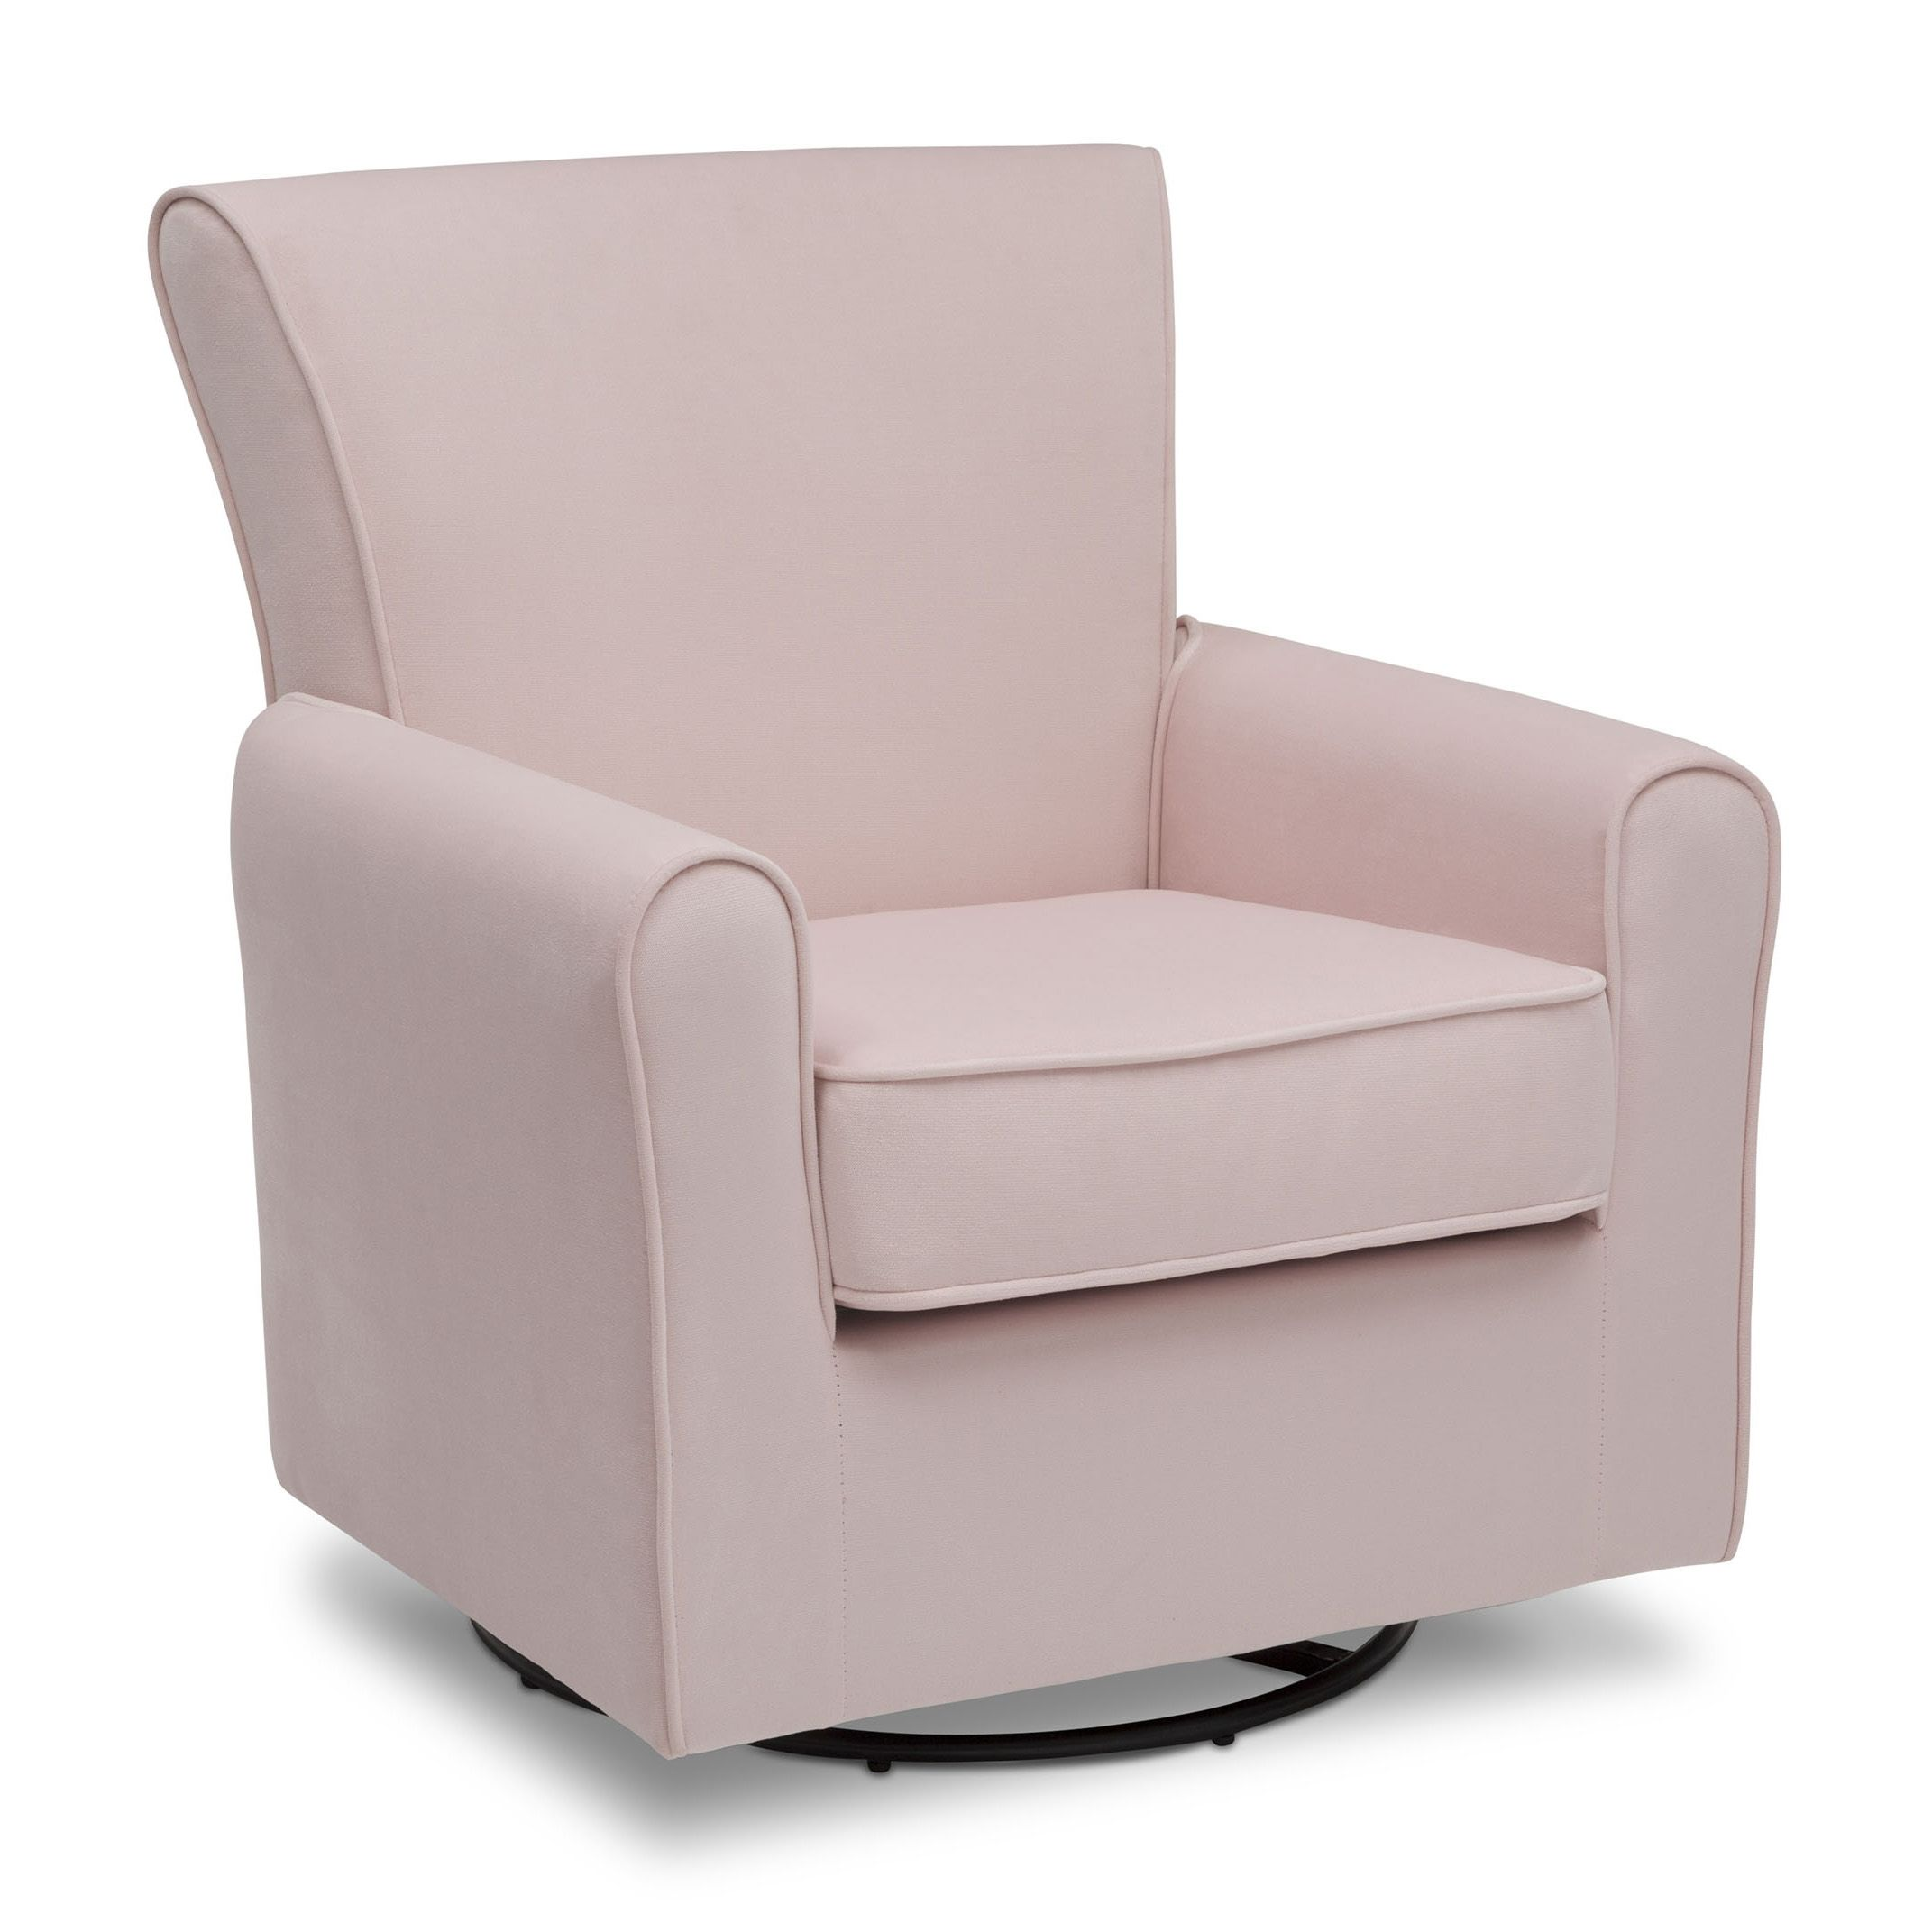 Delta Children Elena Glider Swivel Rocker Chair, Blush